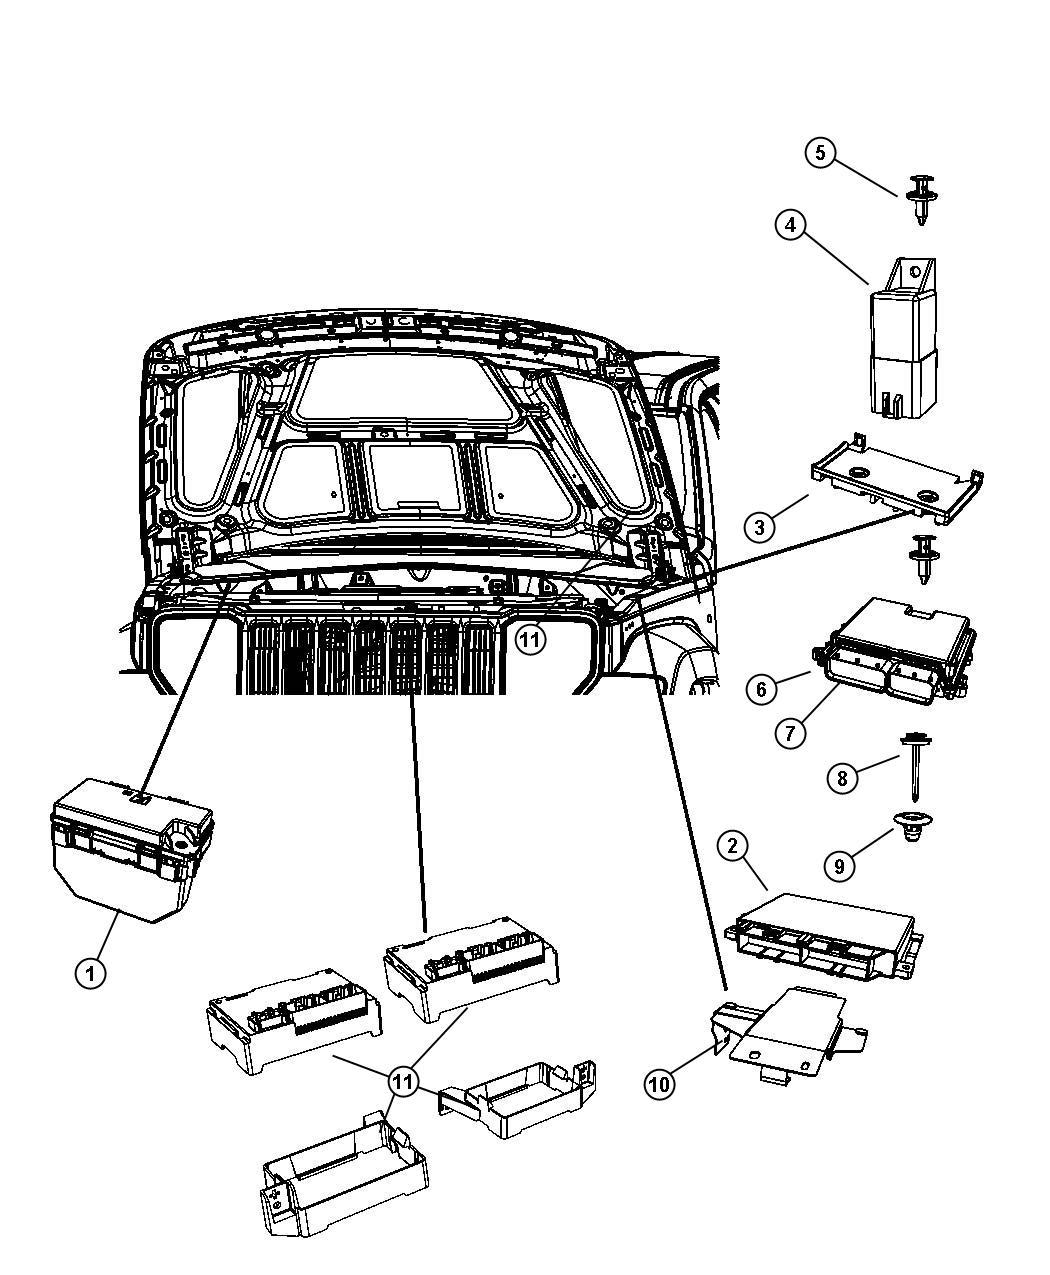 2010 Jeep Liberty Module. Transfer case control